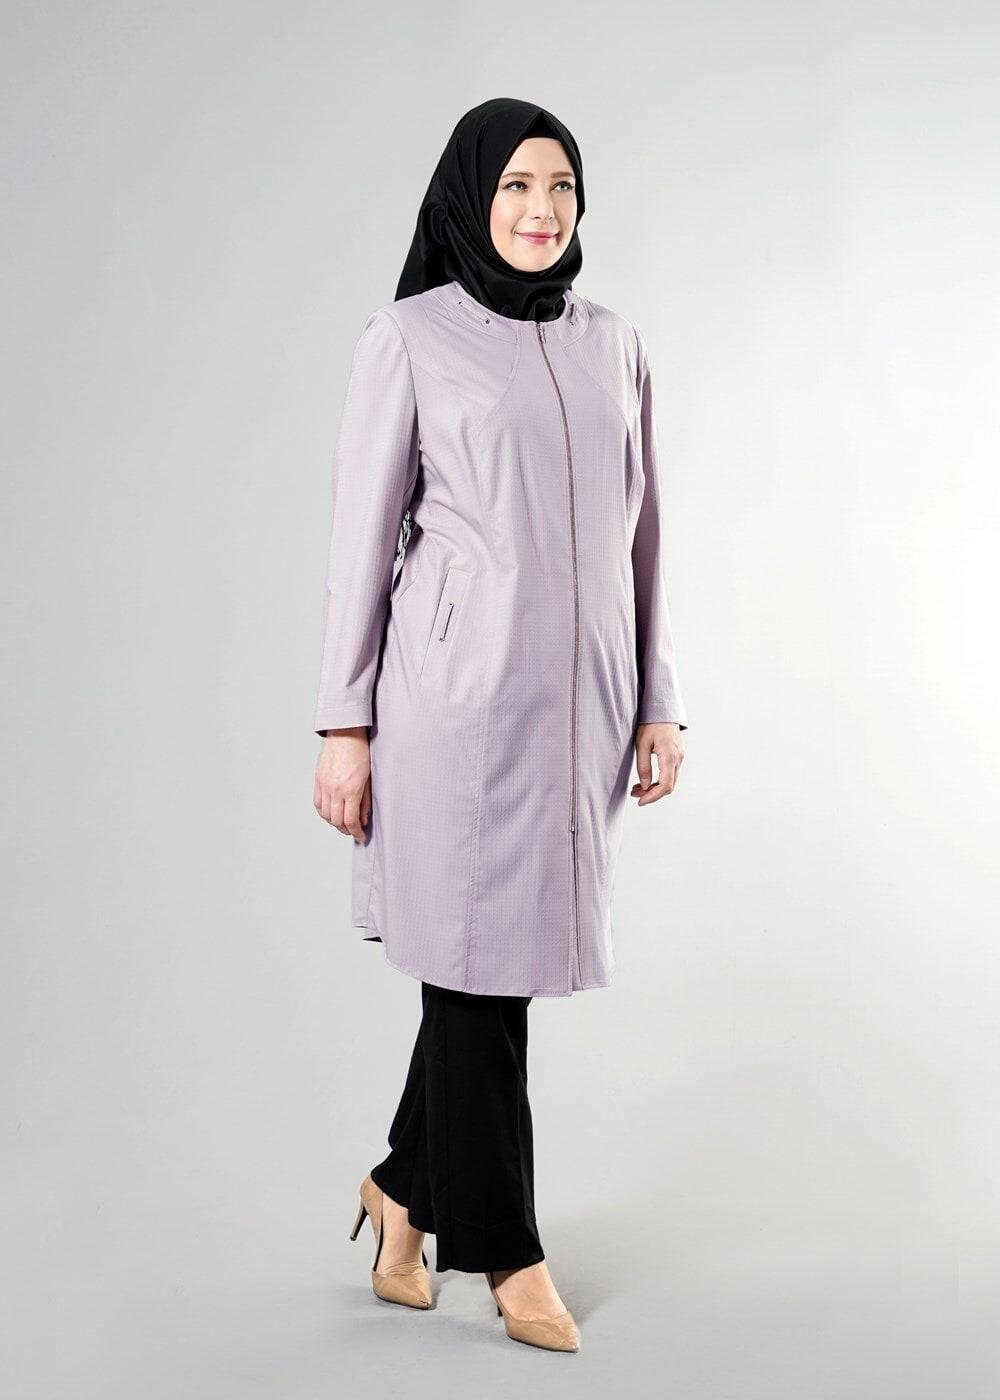 Female POWDER T 1529-1 Söğüt Tesettür Trench-Alv Fashion